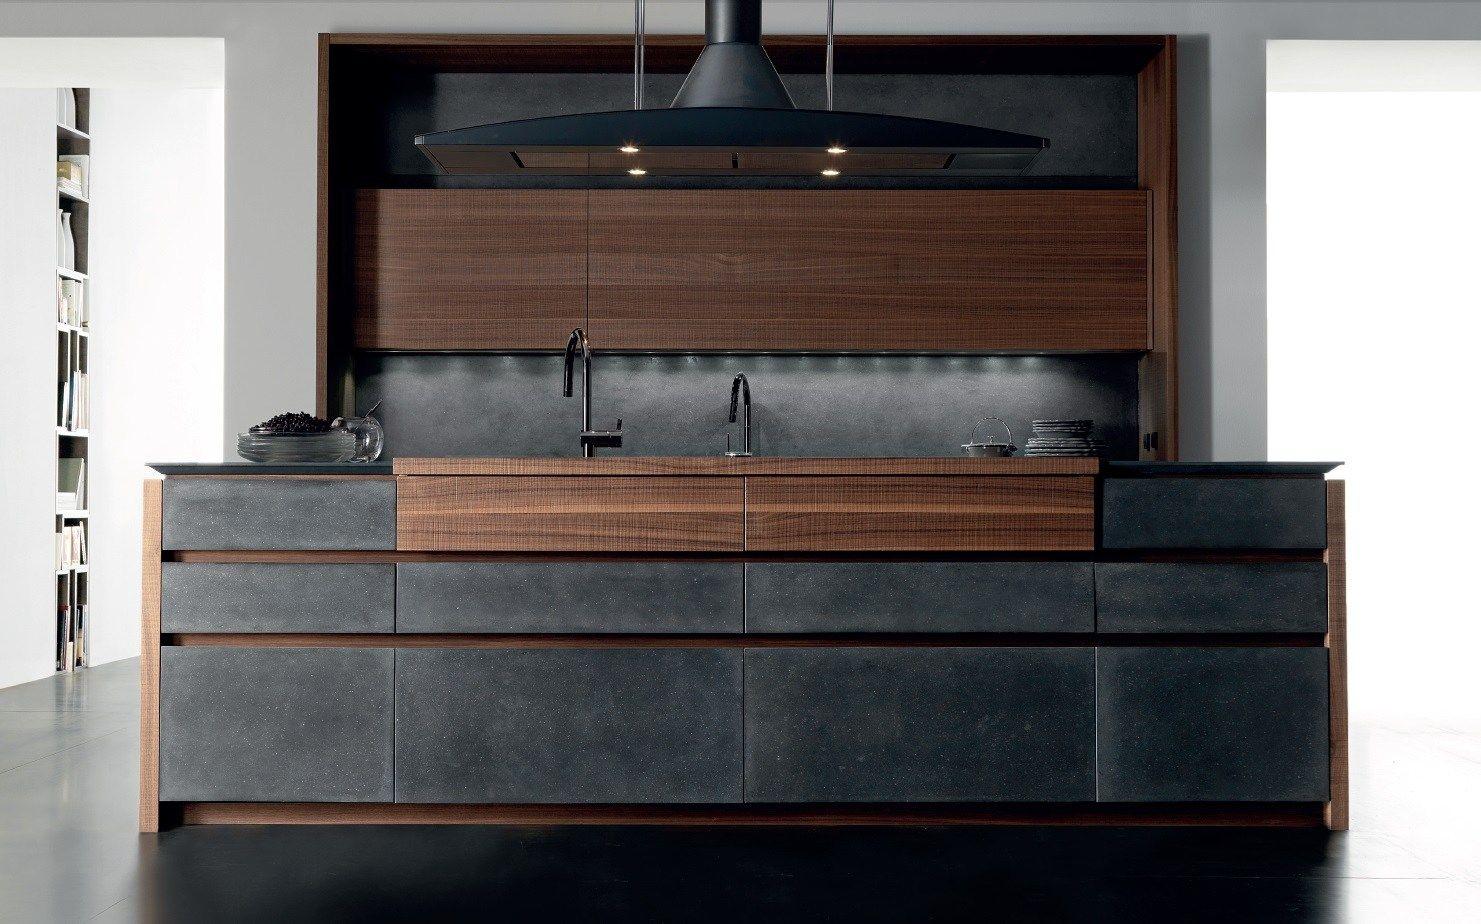 Cucina in cemento con isola wind cemento eta noir by - Cucine in cemento ...